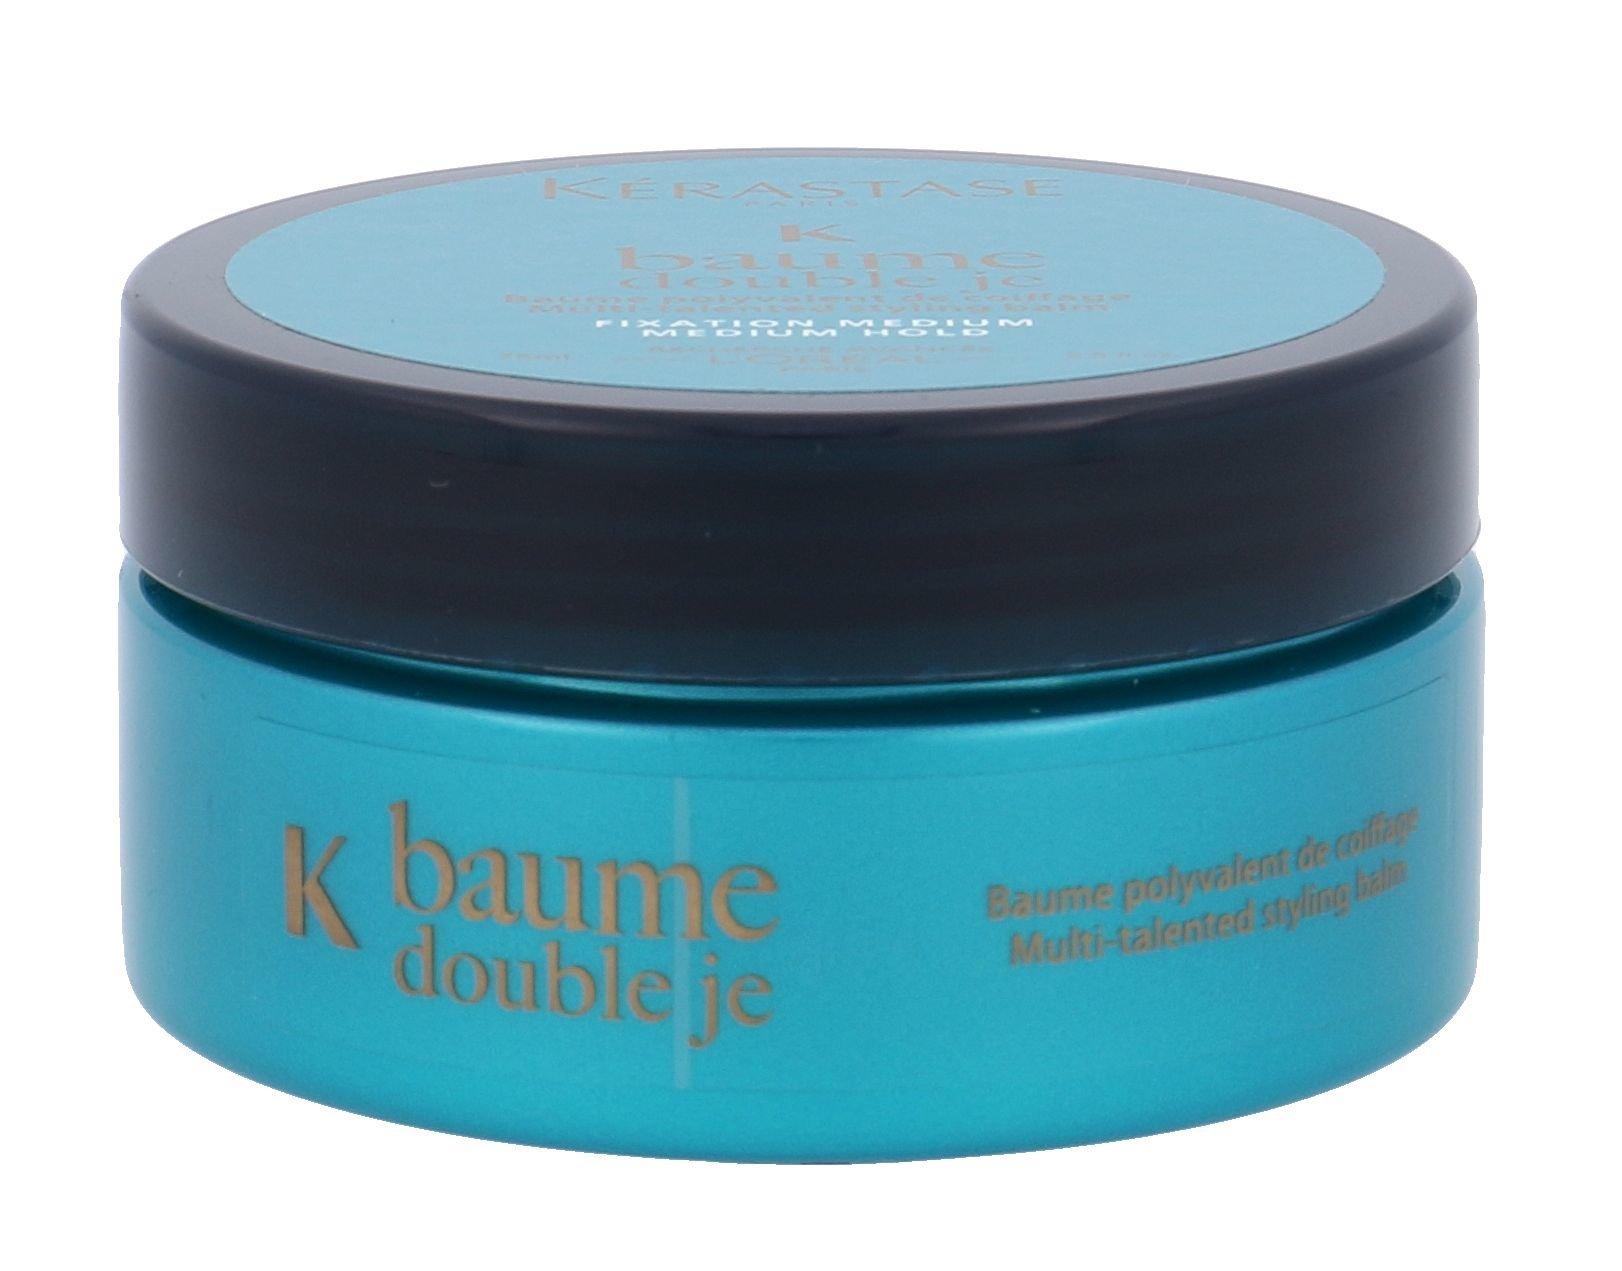 Kérastase Baume Double Je Cosmetic 75ml